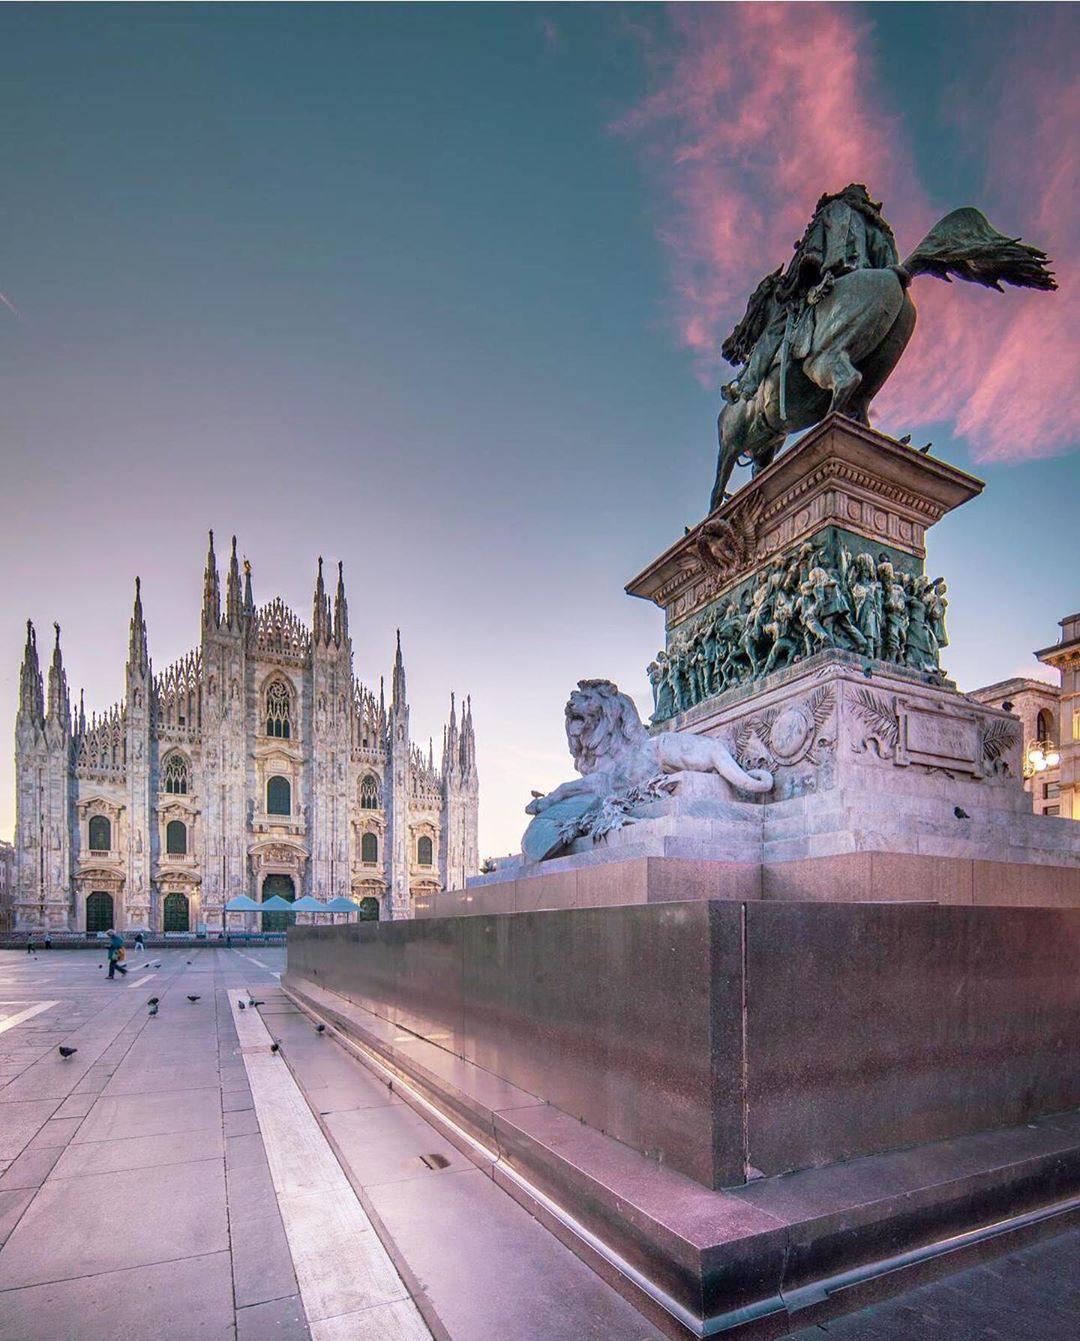 "Dr Hamad Al-Barjas on Instagram: ""Forza Milano 🇮🇹 . . . . #ig_italia #bestcitybreaks #hello_worldpics #milanocityitalia #ilikeitaly #yallersitalia #duomomilano #culturetrip…"""